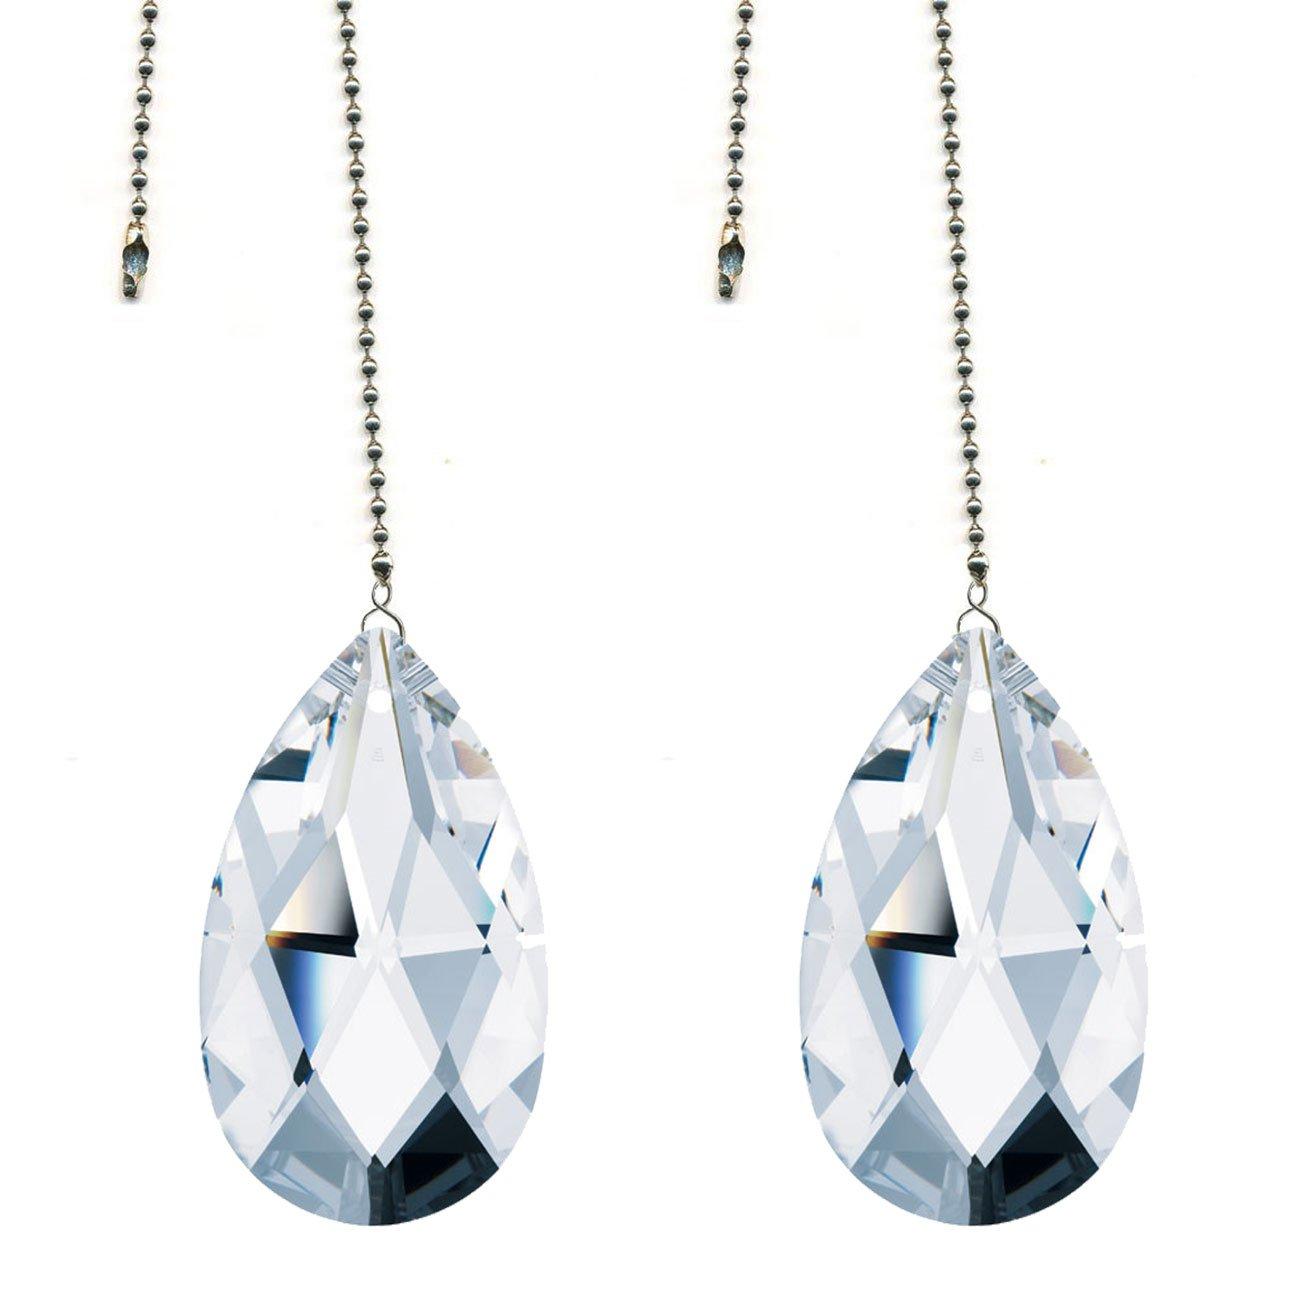 CrystalPlace Ceiling Fan Pull Chain Swarovski Strass Clear Crystal Almond Prism Fan Pulley Set of 2